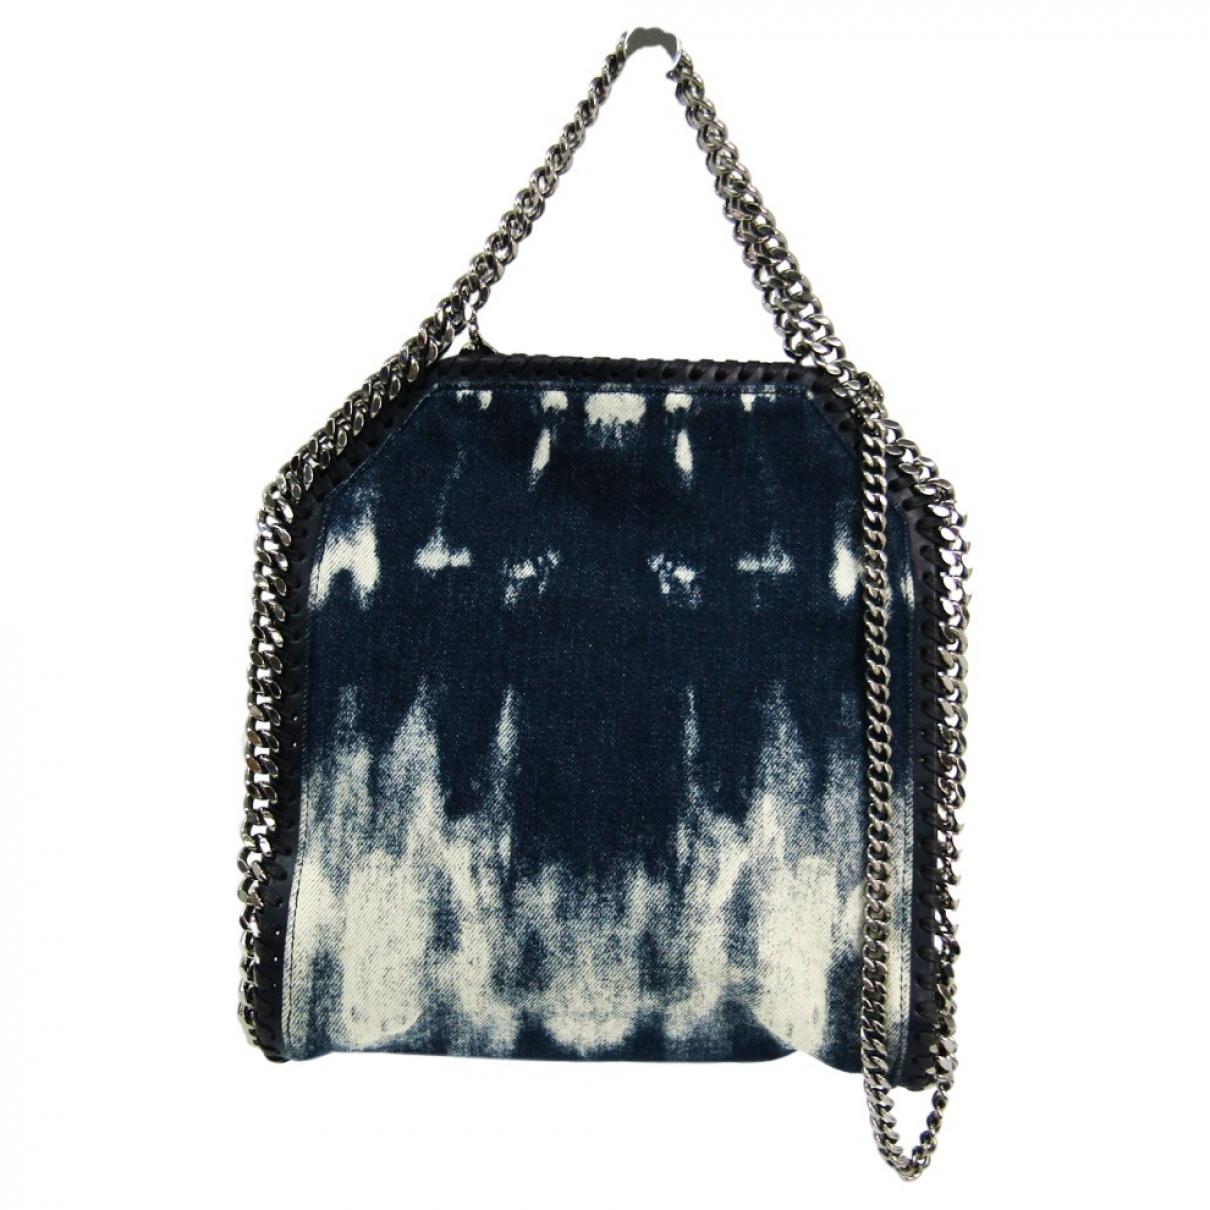 Stella Mccartney Falabella Navy Denim - Jeans handbag for Women \N